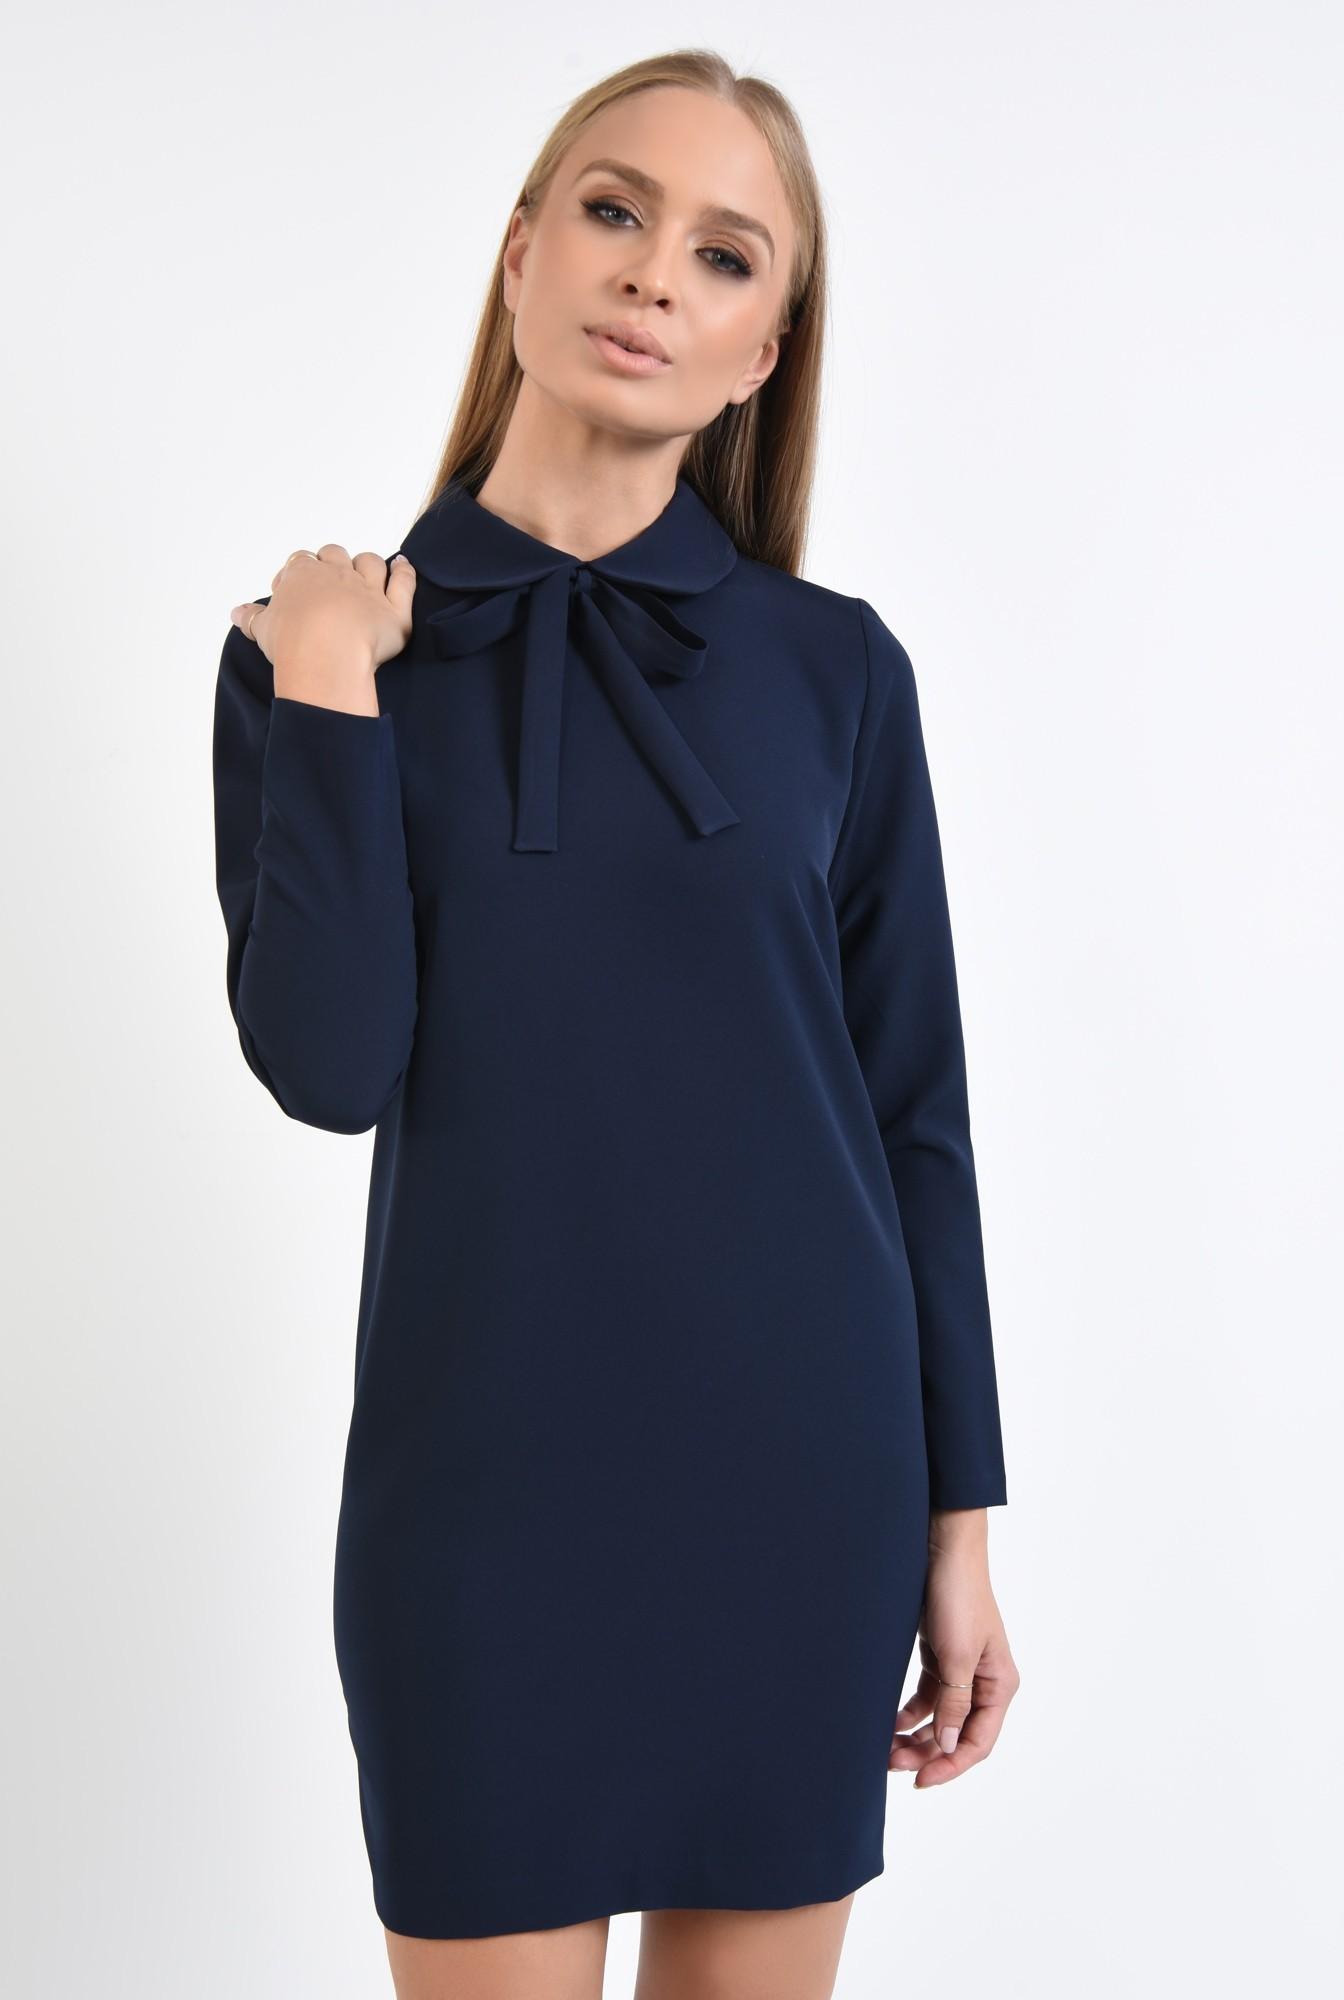 2 - rochie de zi, scurta, bleumarin, maneci lungi